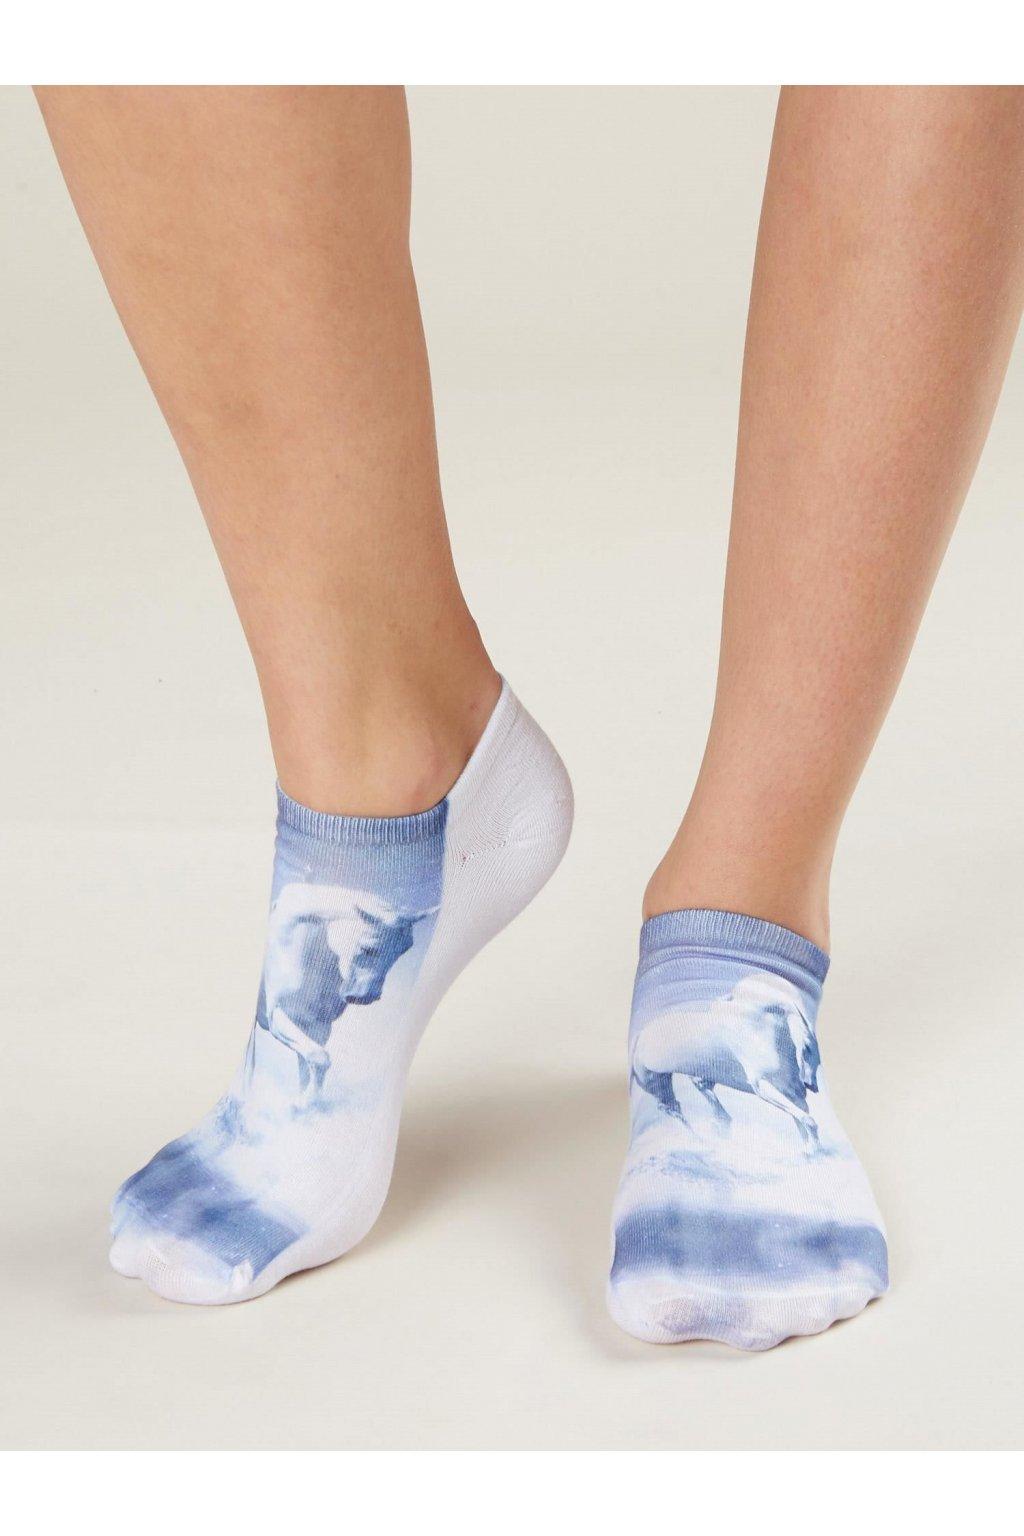 Dámske ponožky kód 7-SR-PWF-01592-1